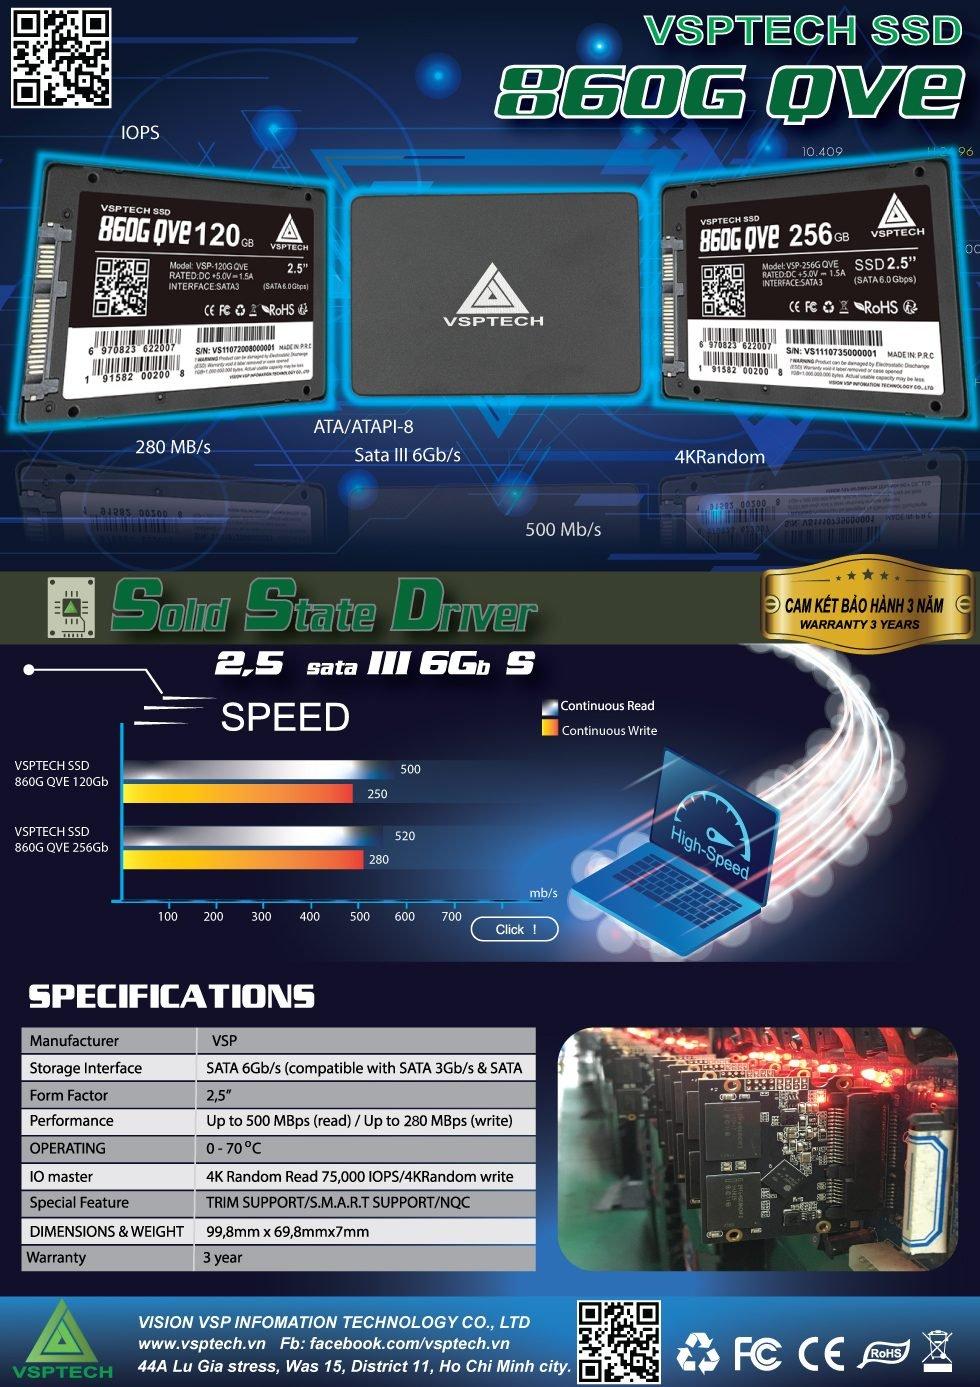 SSD 128G VSPTECH 860G QVE